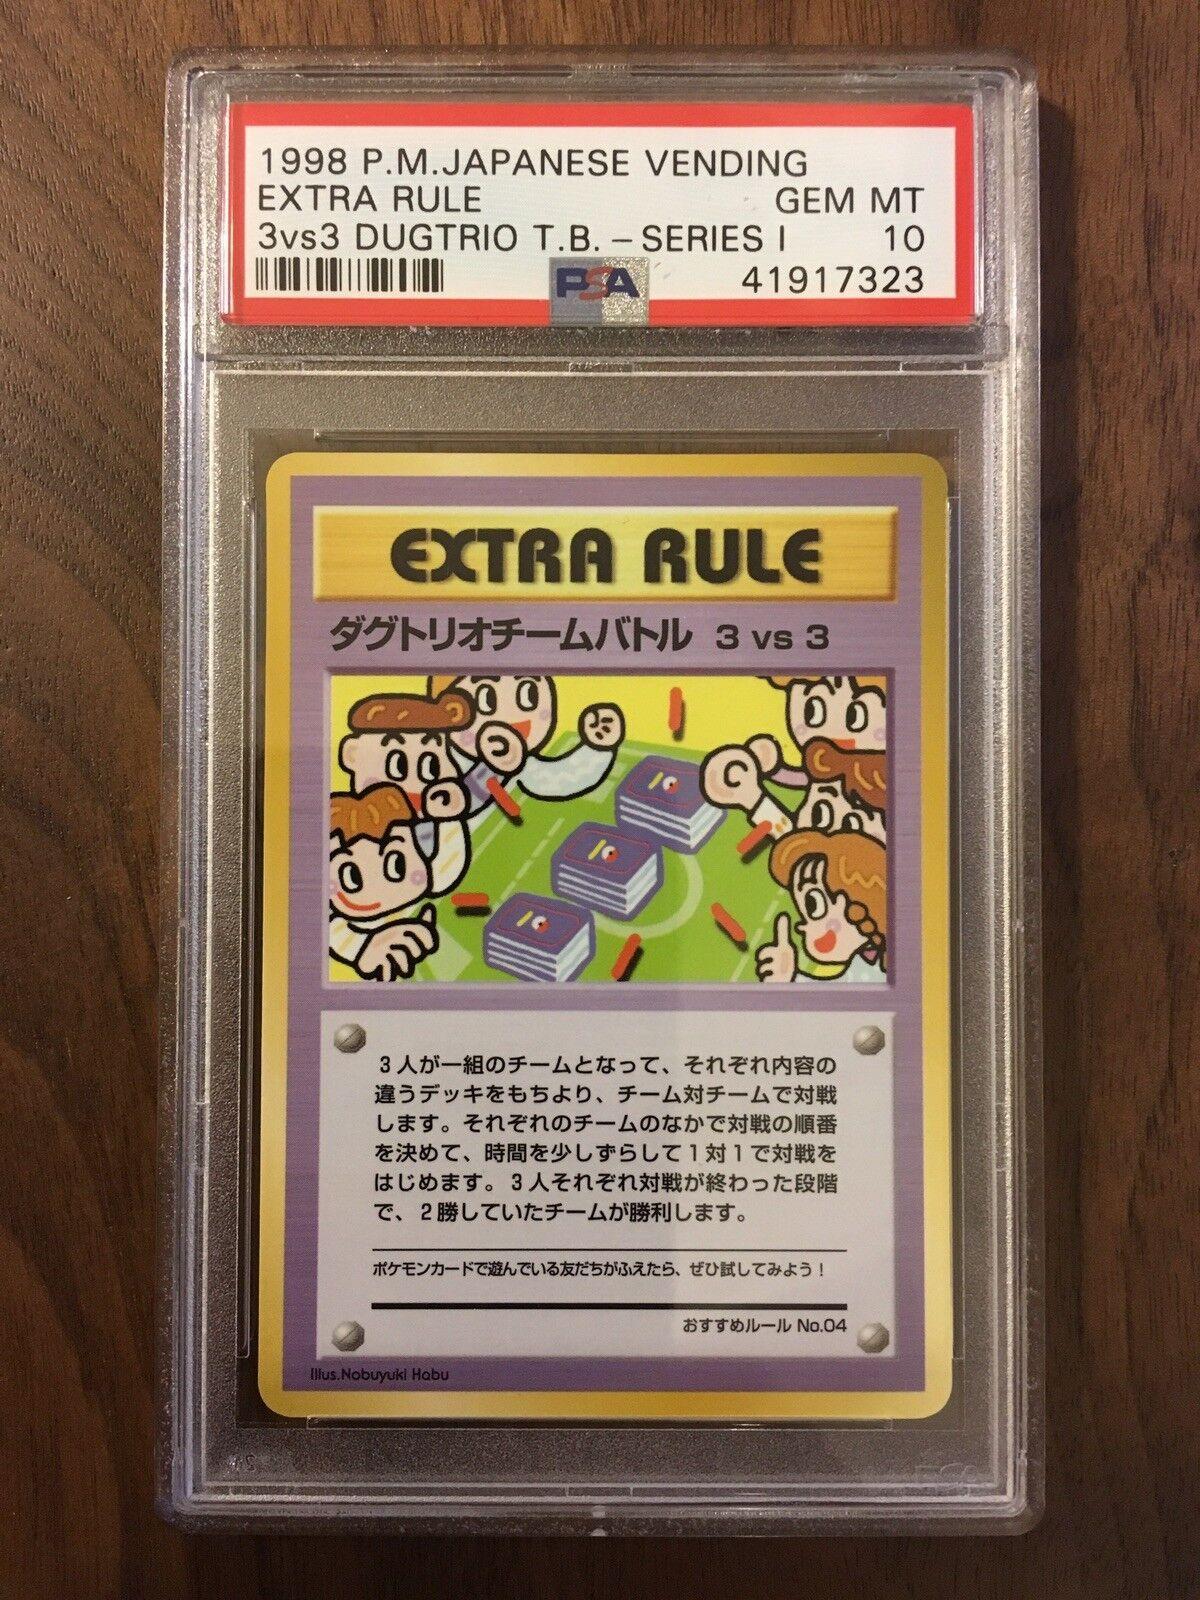 Pokémon - japanische - serie 3 - 3   3 dugtrio team battle (artikel 10) psa